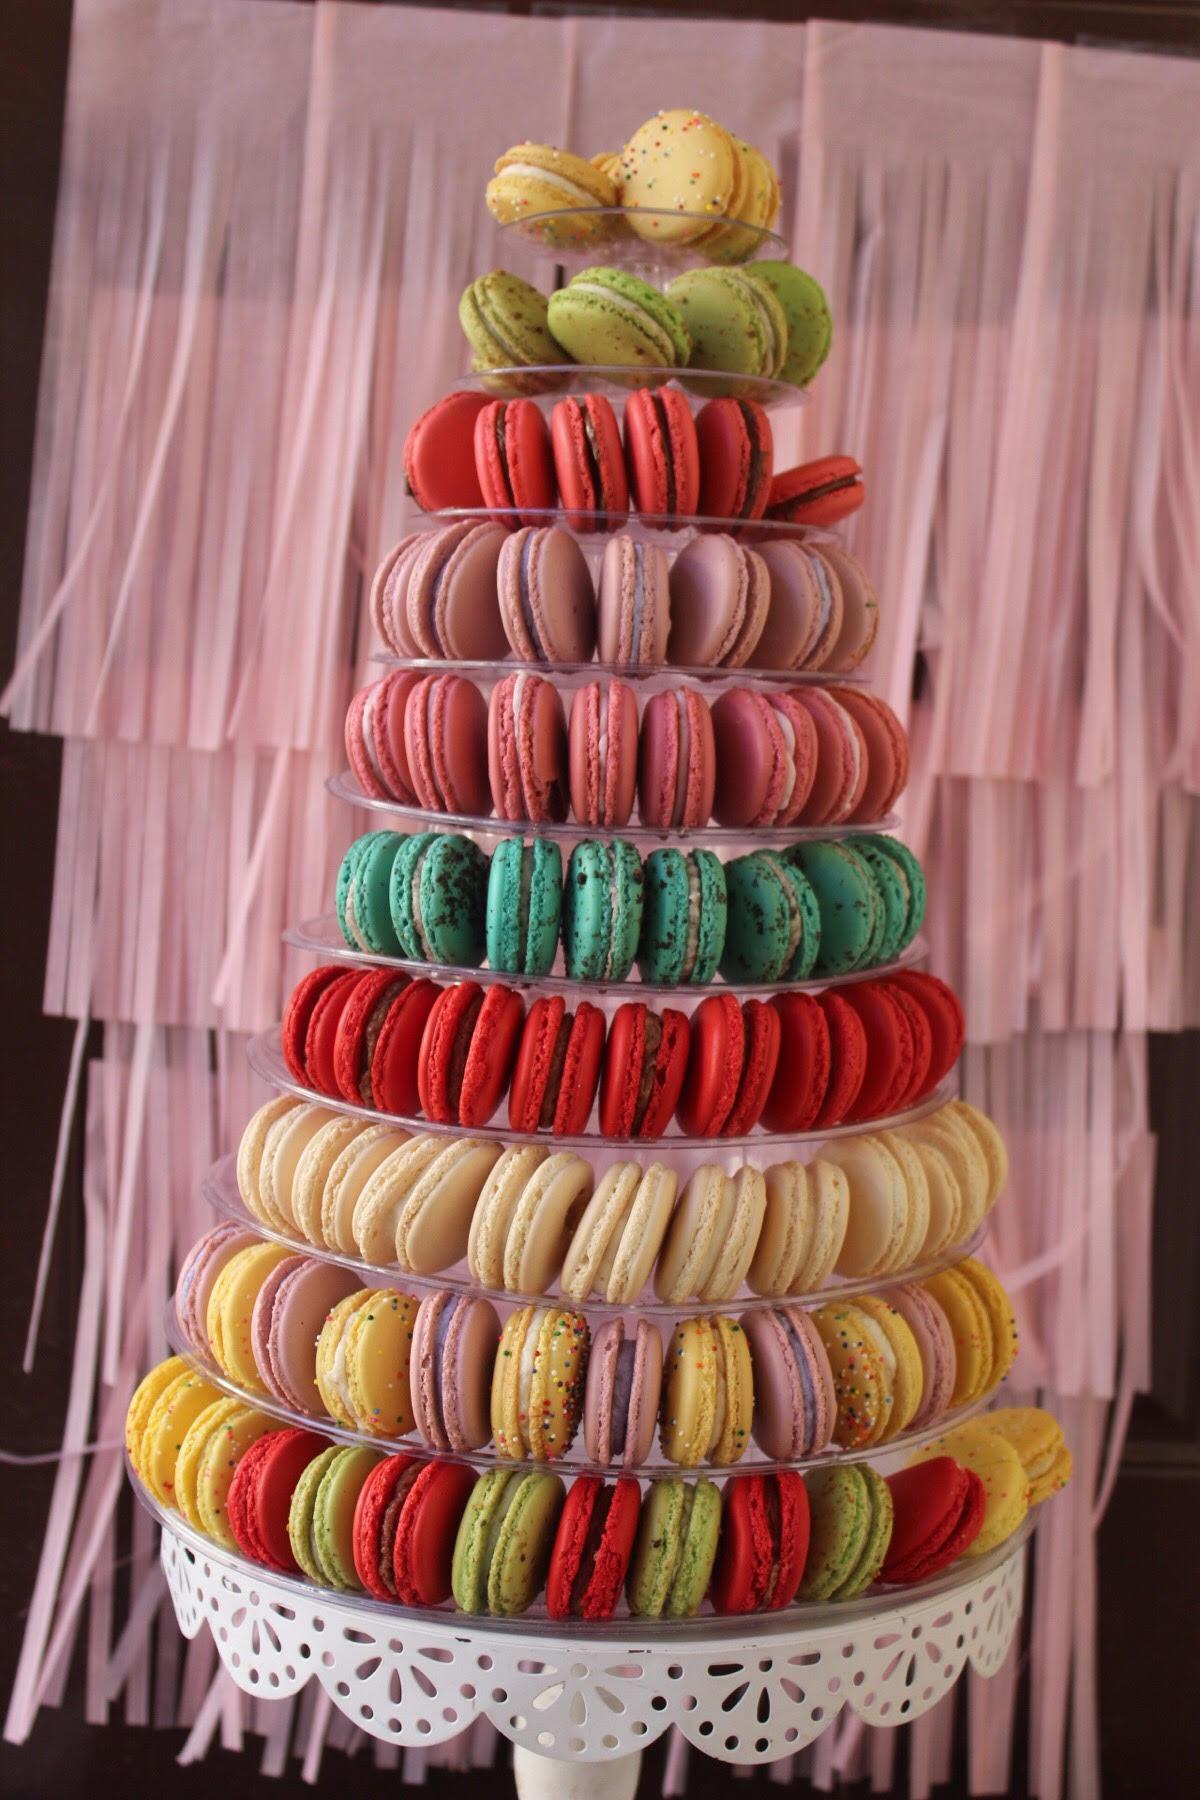 Contemporary Macaron Tower - Choose between 3-12 dozen macarons to assemble on an acrylic macaron tower.